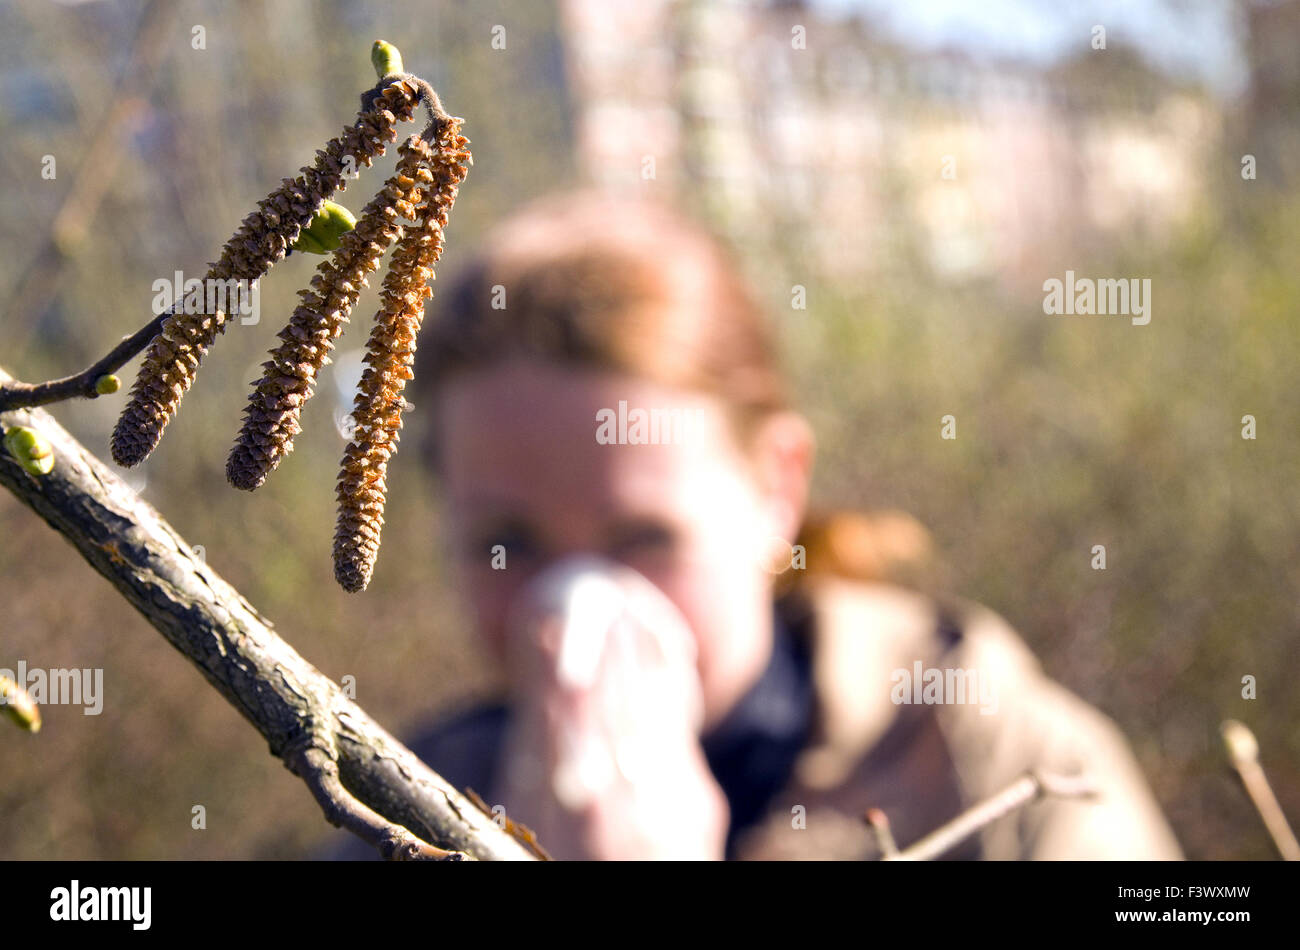 Alergia Foto de stock